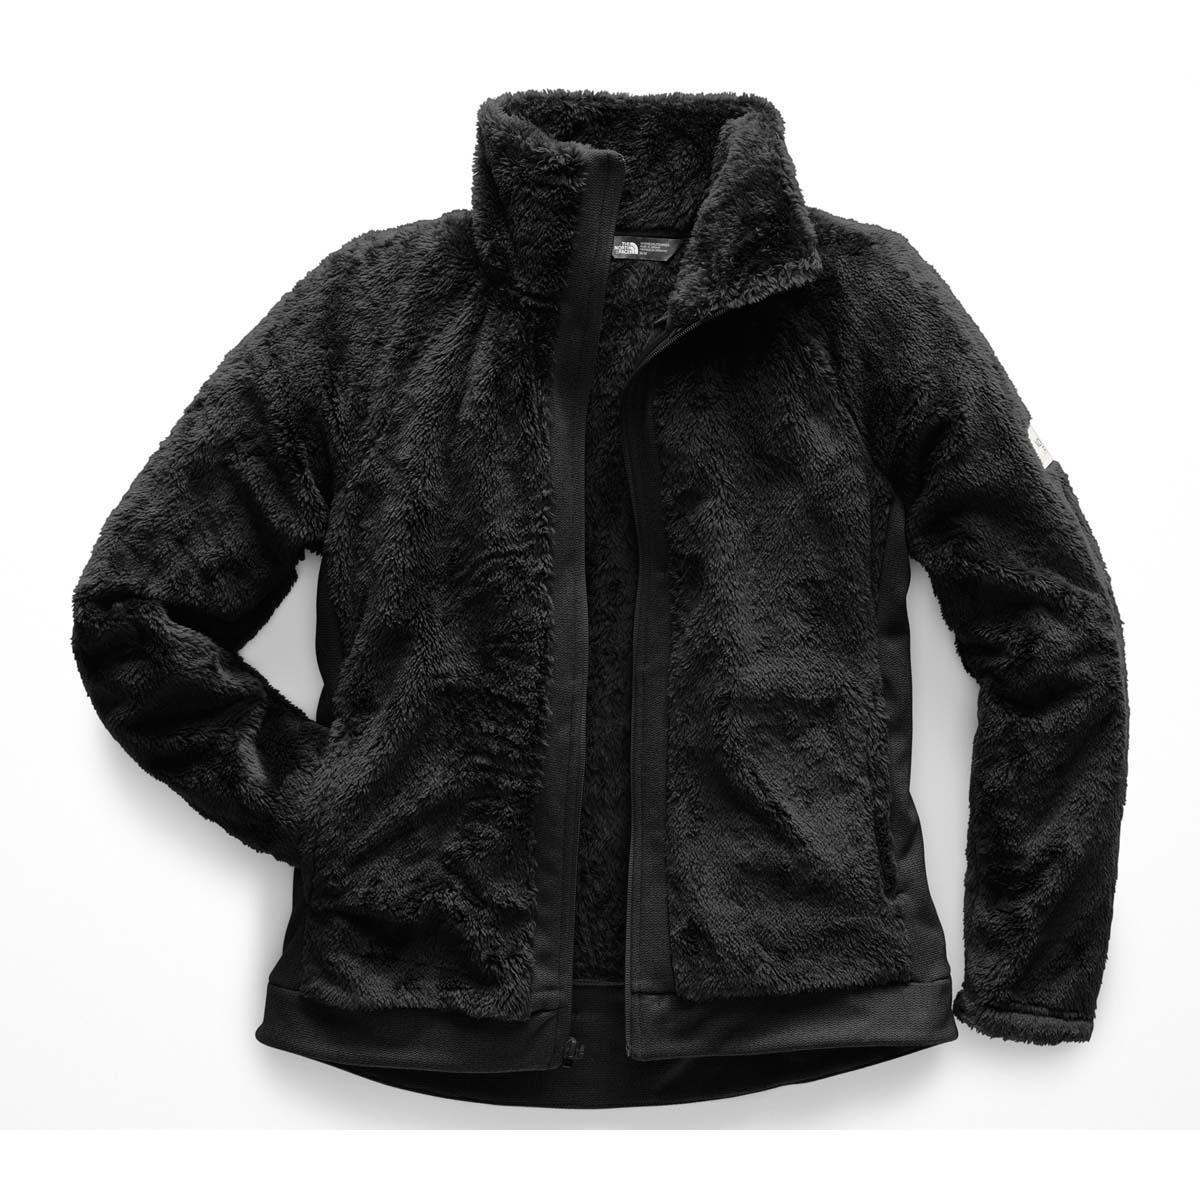 cccdc015b The North Face Furry Fleece Full-Zip - Women's